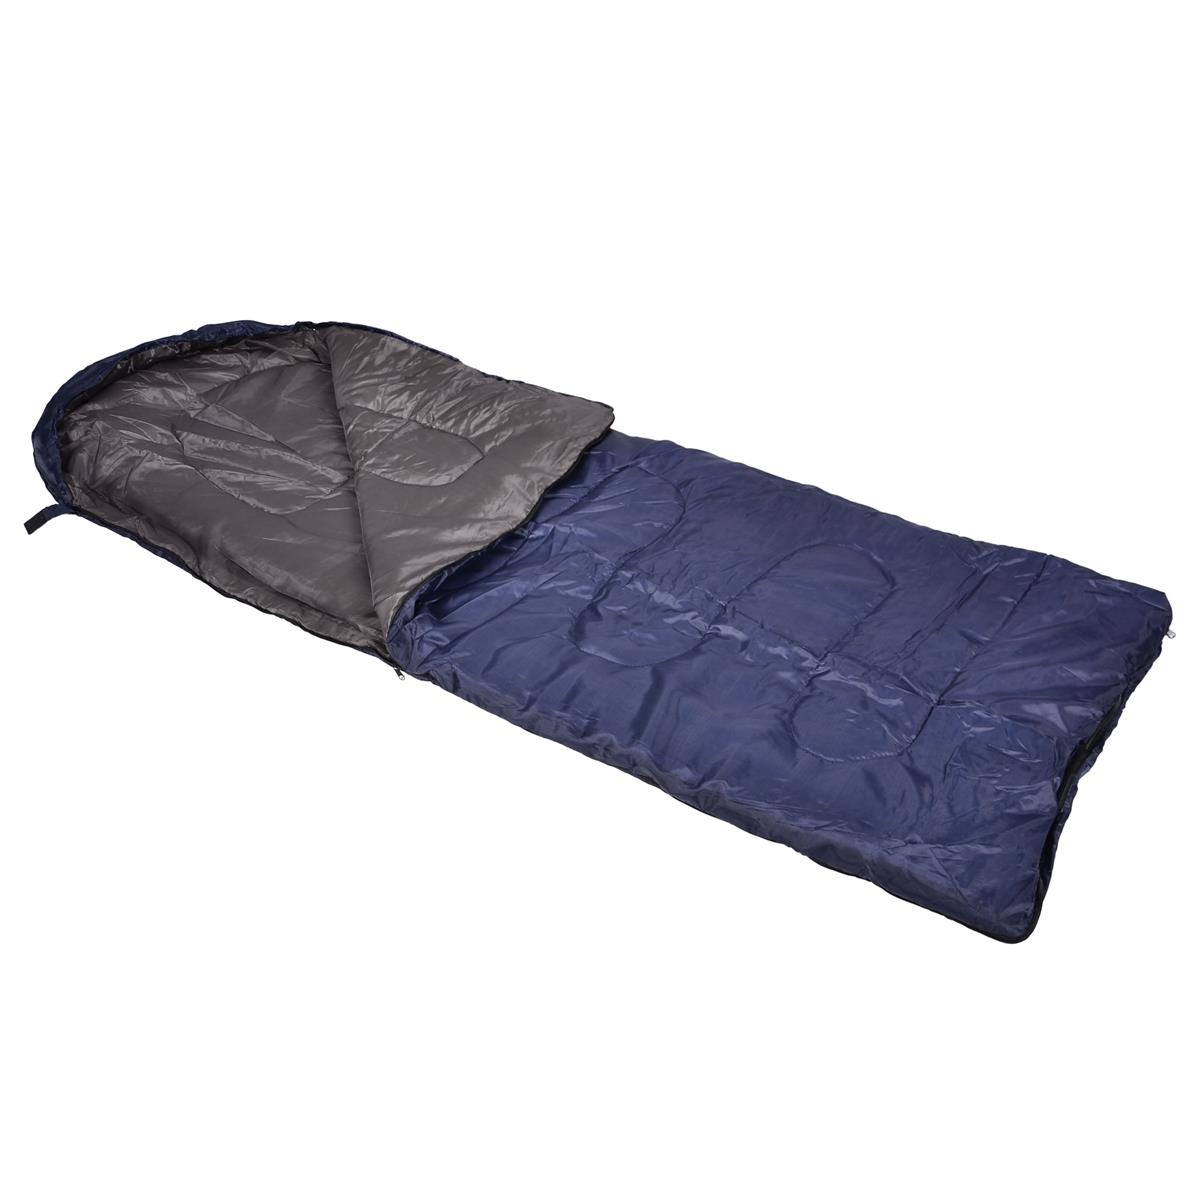 Schlafsack 180 cm blau 200g/m² Polyester Camping